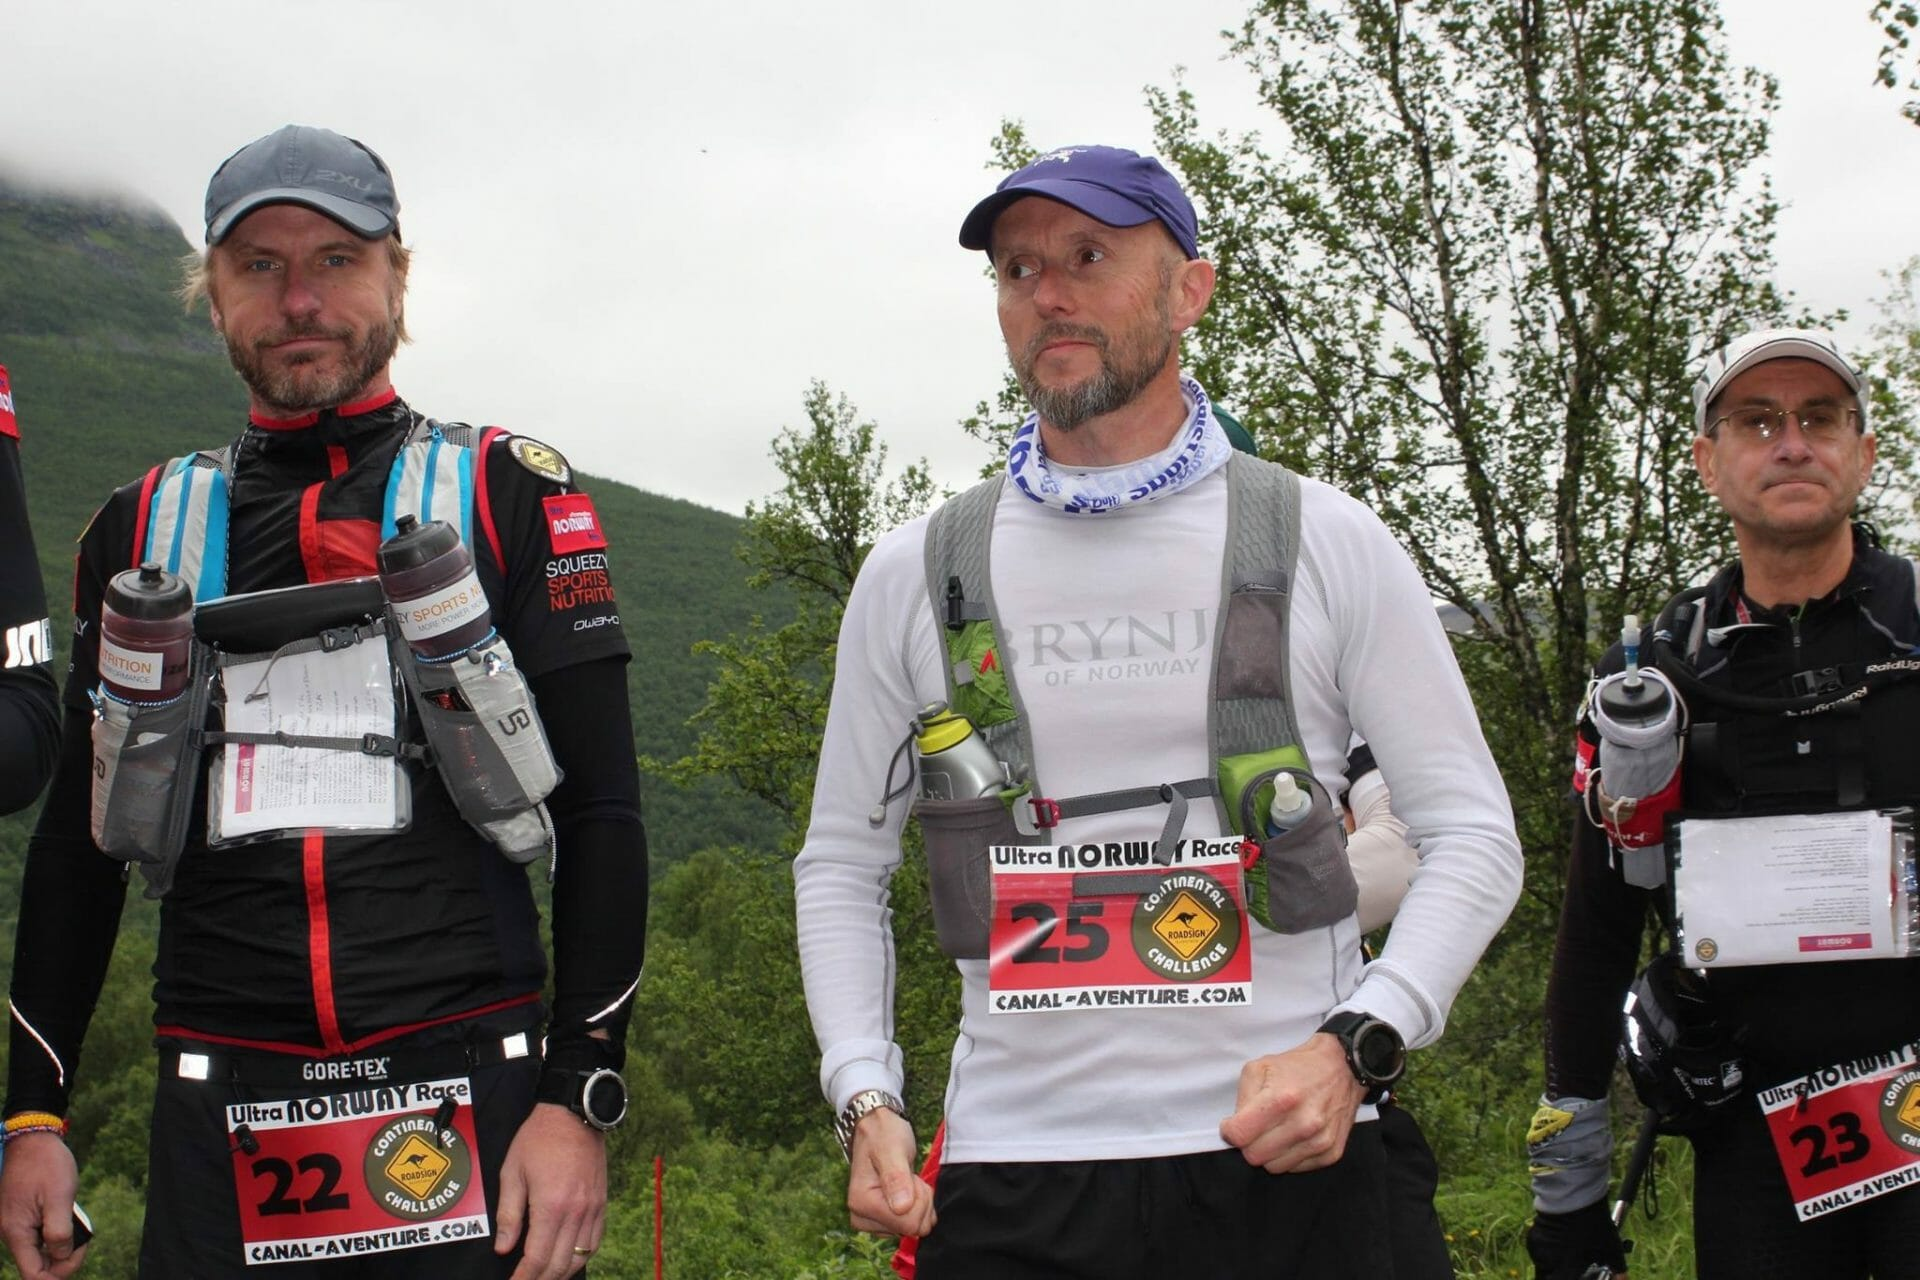 Canal-Aventure :: start, Ultra Norway Race